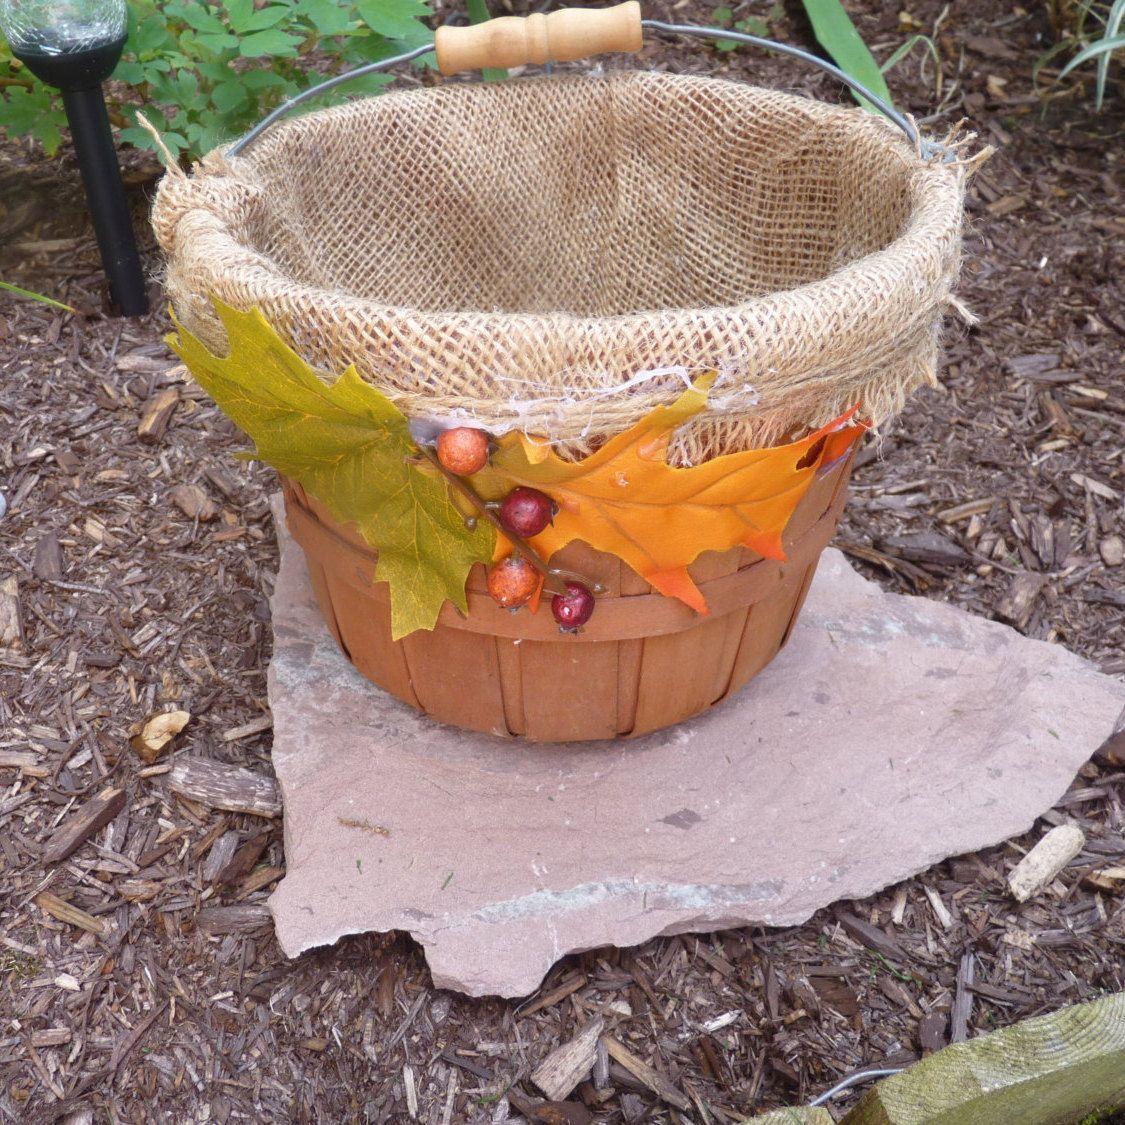 Best Free Of Charge Fall Bushel Basket Rustic Fall Wedding Basket